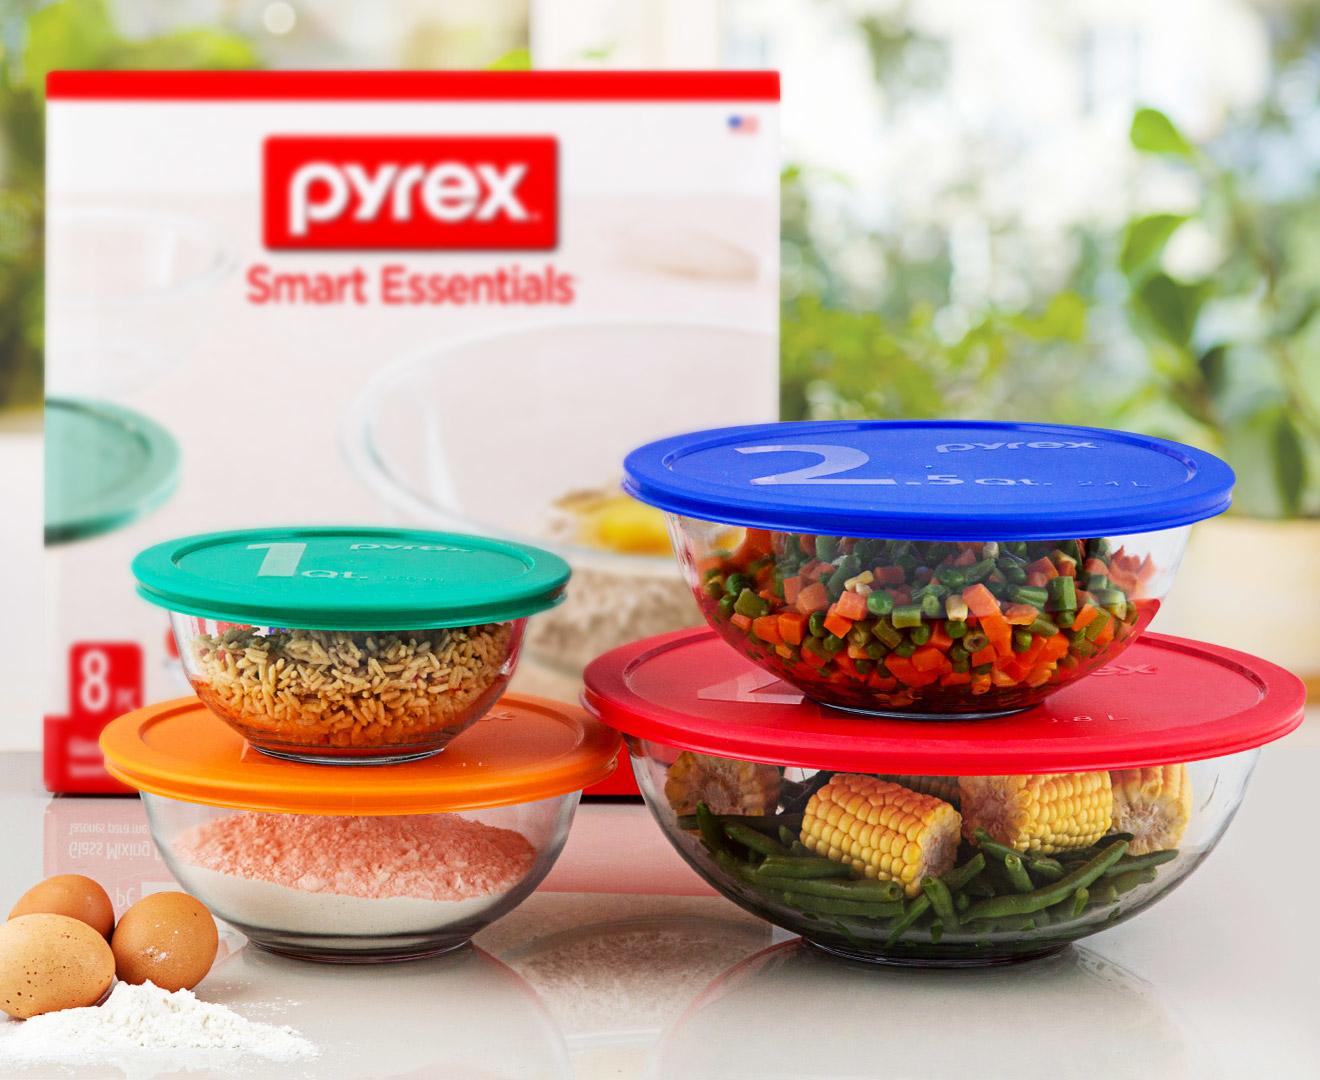 pyrex 8 piece glass mixing bowl set ebay. Black Bedroom Furniture Sets. Home Design Ideas